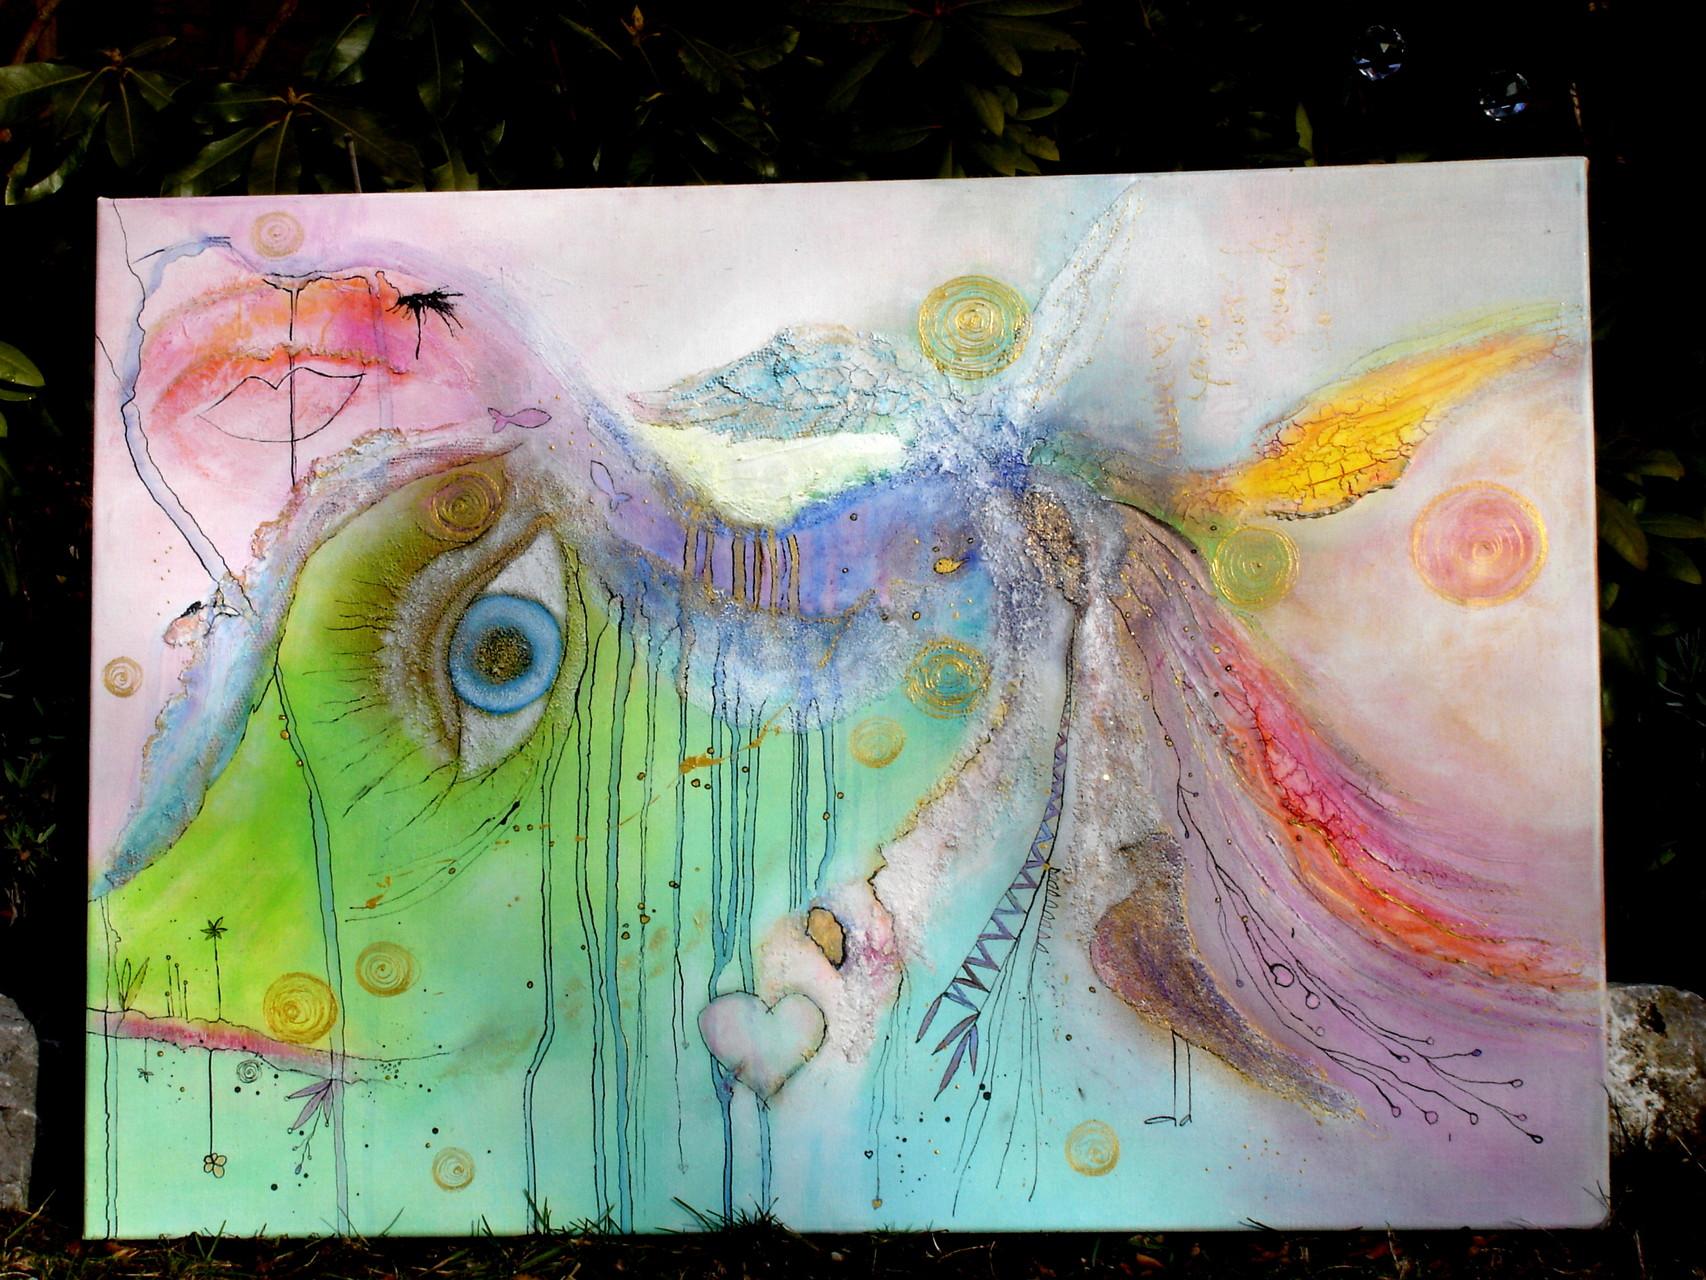 'Träumchenmalerei' - 2016/2 - Acryl auf Leinwand - 100 x 70 cm - verkauft